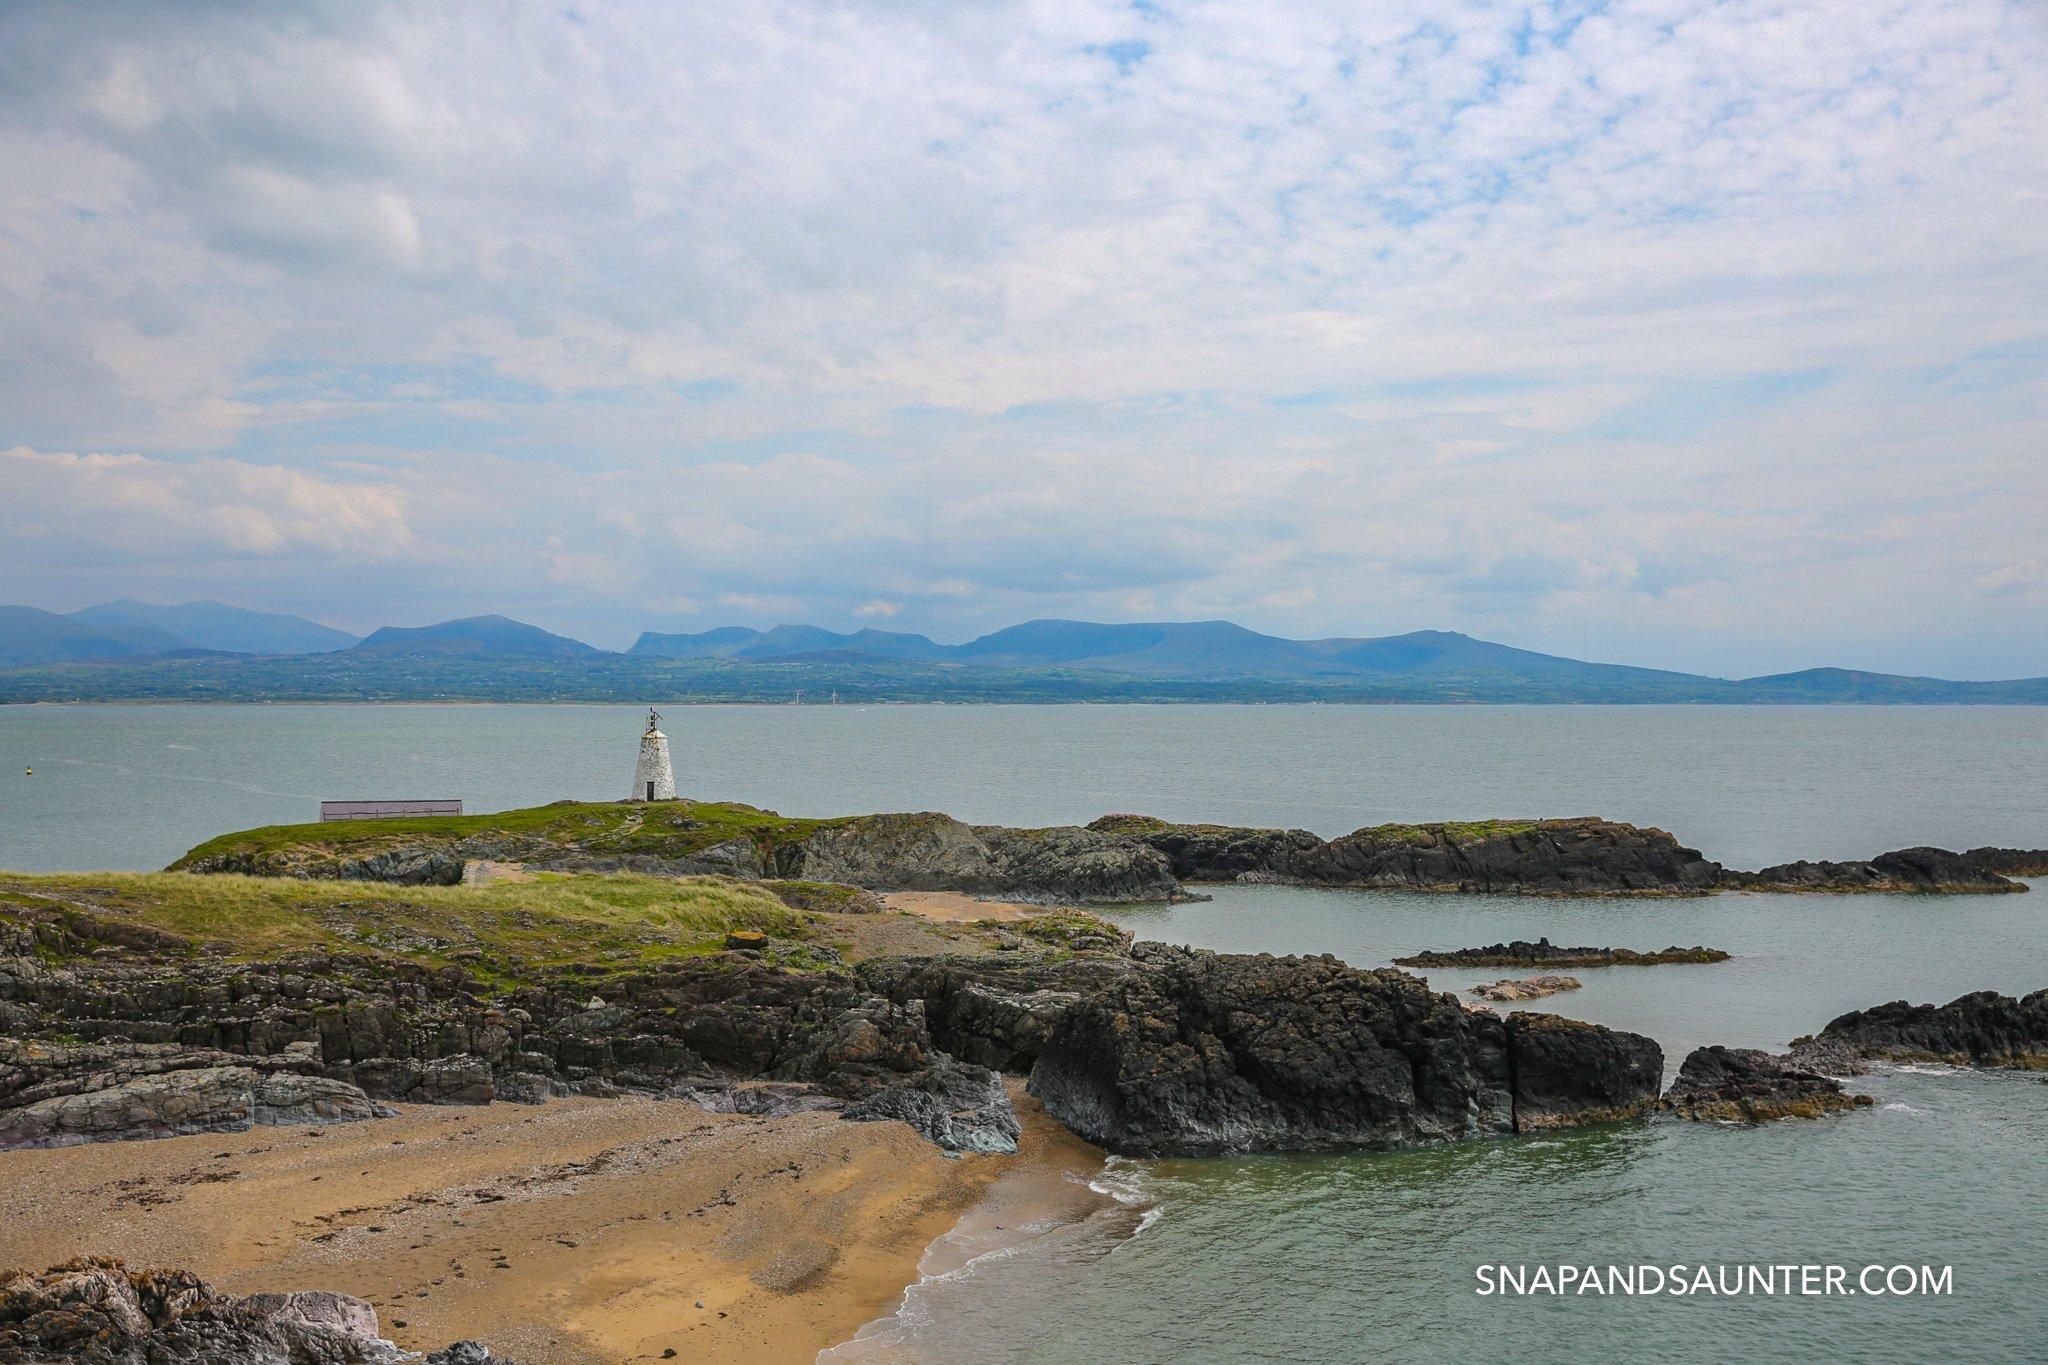 Llandwyn Island in Anglesey in Wales